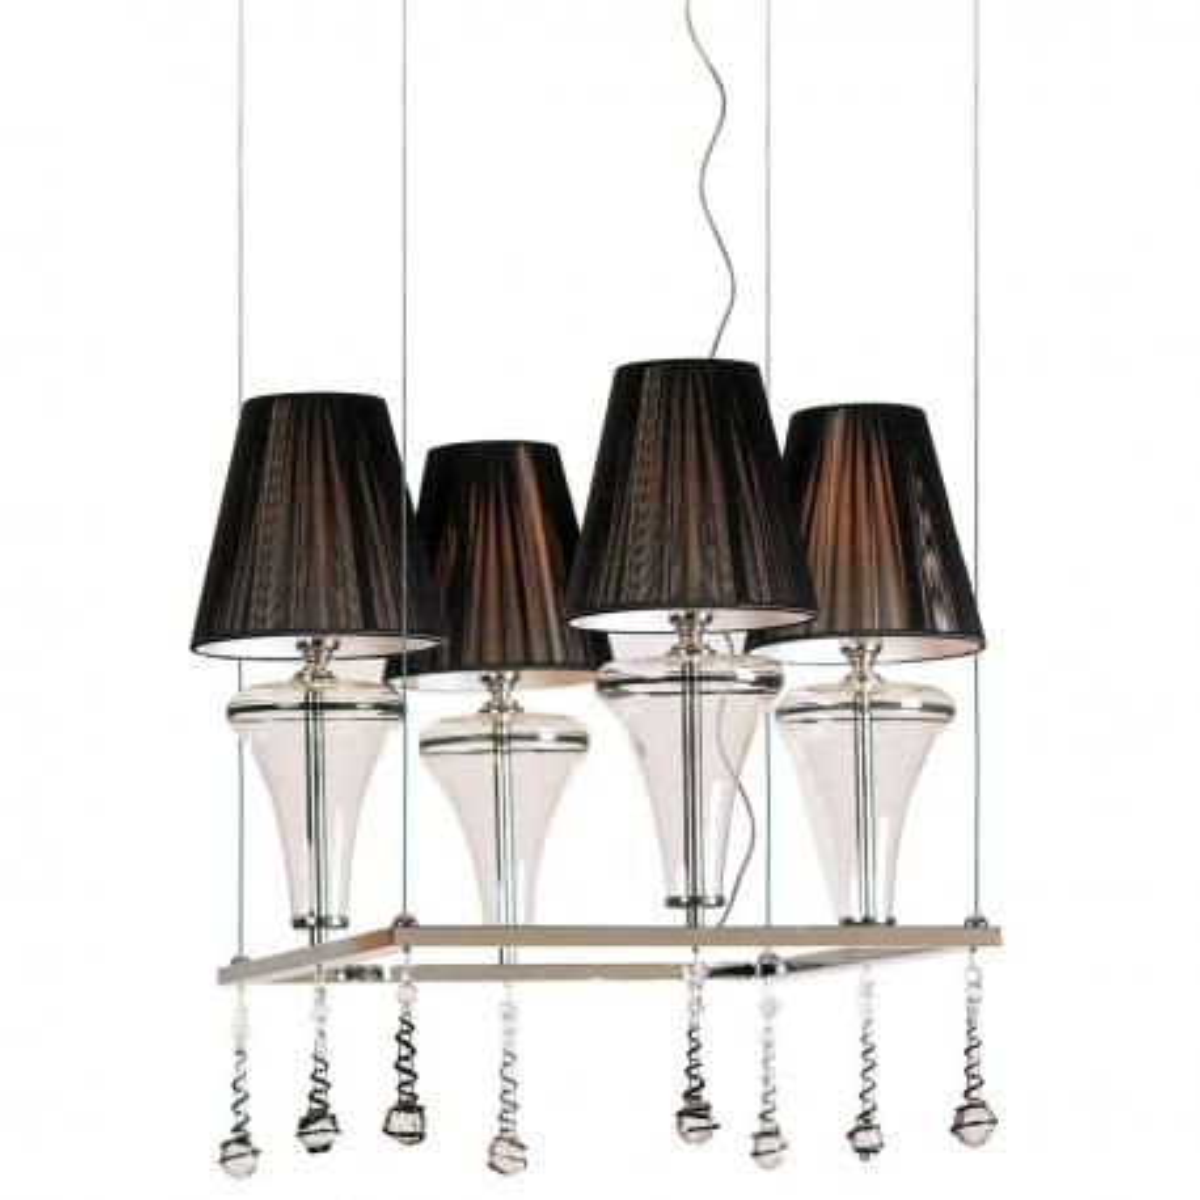 """Dalila"" lampara de araña de Murano - 4 luces - transparente y nergro"